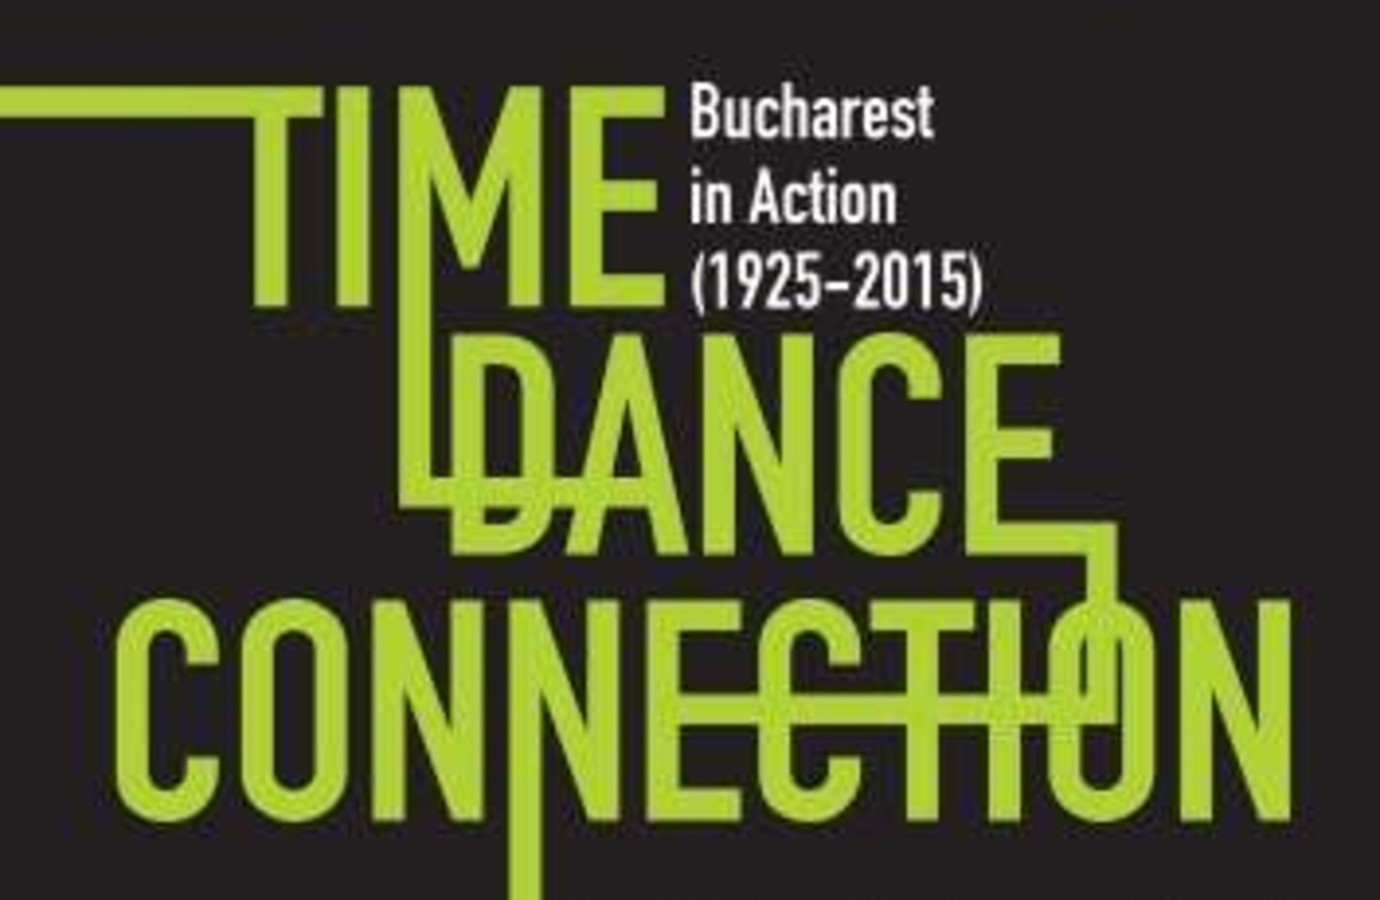 Eveniment Esther Magyar Gonda în cadrul programului Time Dance Connection. Bucharest in Action (1925 – 2015)